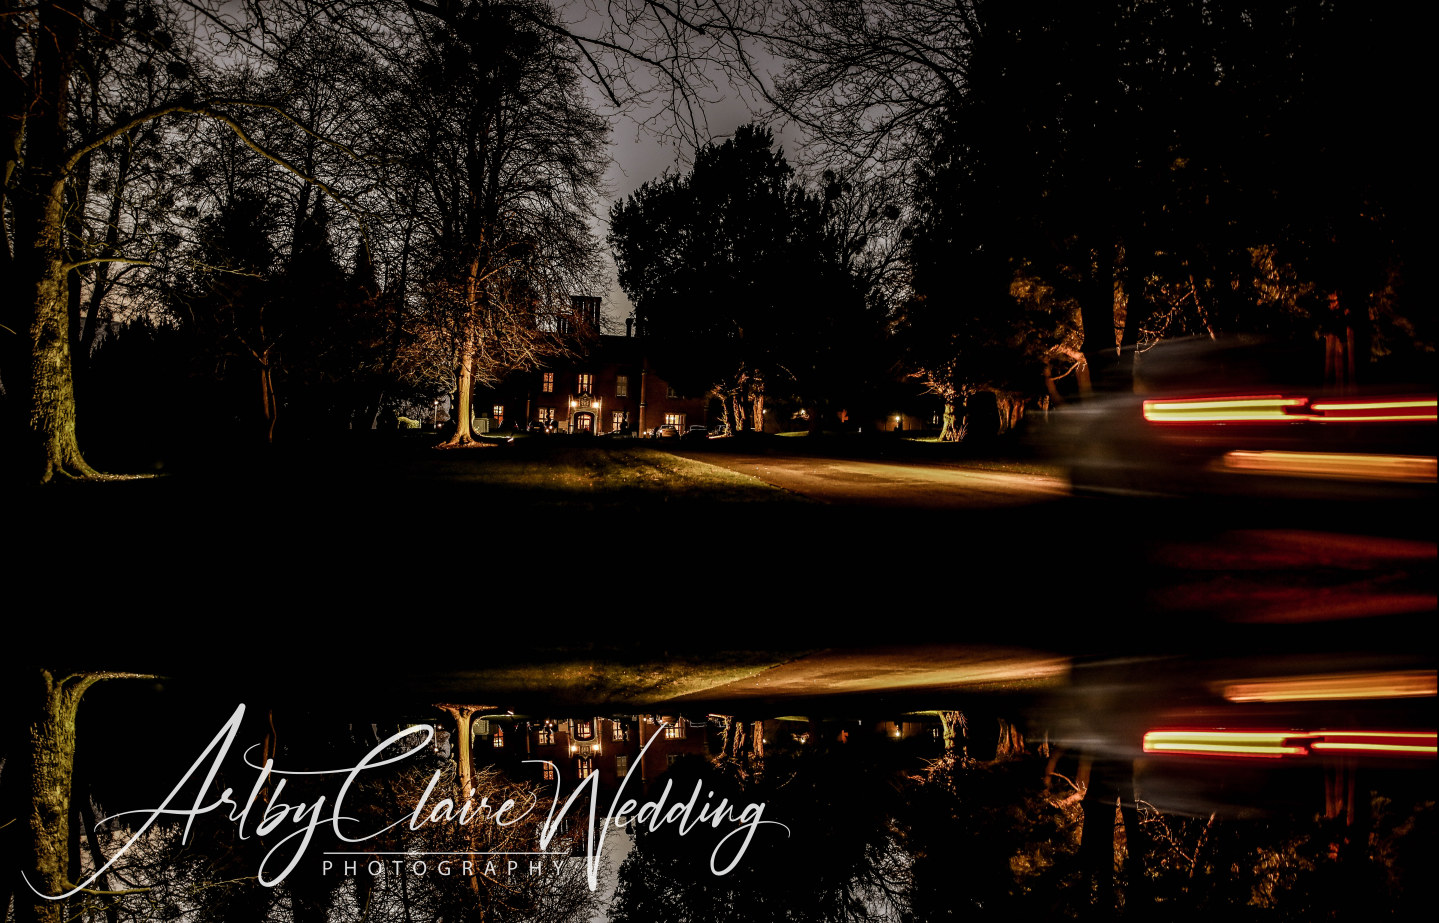 ArtbyClaire Wedding Photography at De Vere Latimer House, Chenies, Latimer